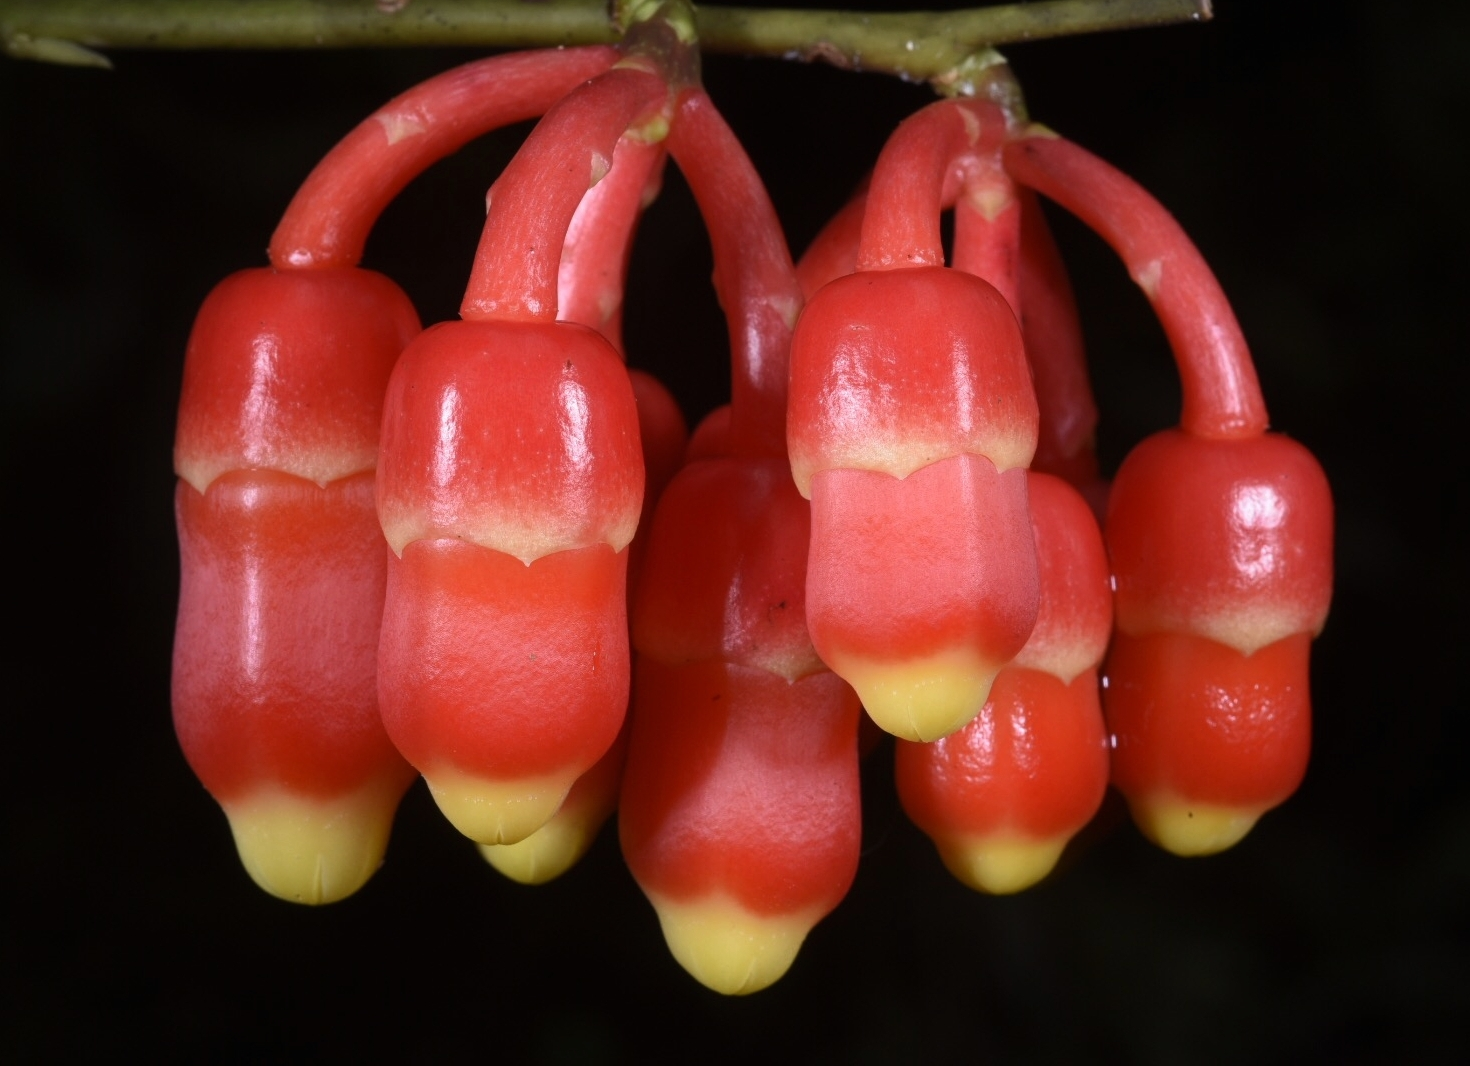 Psammisia williamsi  immature flowers. Fortuna, Chiriquí Province, Panamá (Image: F. Muller).